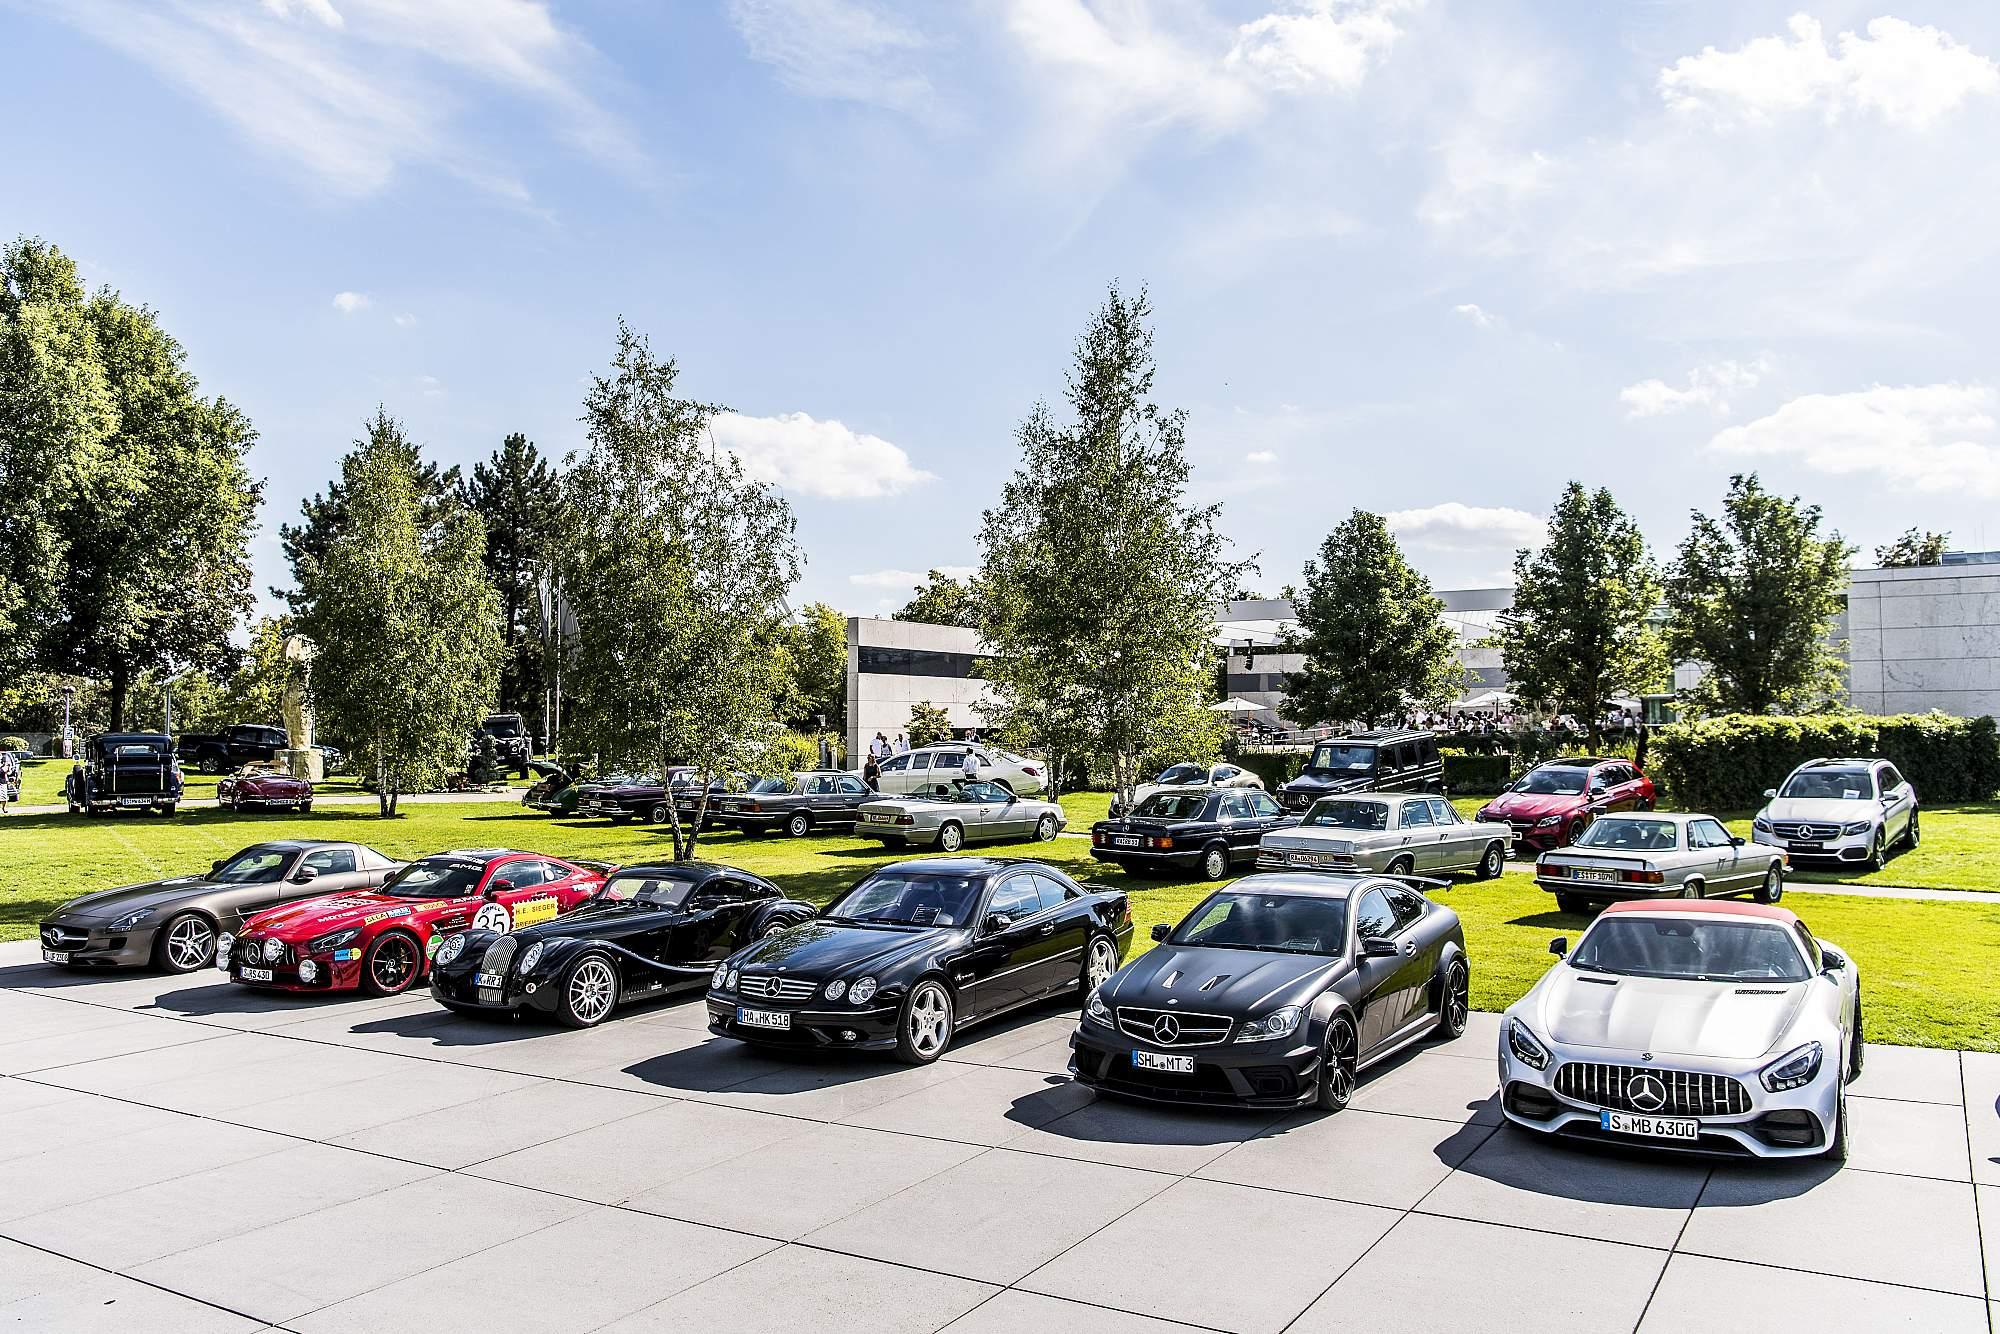 bb heute: die parade der automobilen klassiker